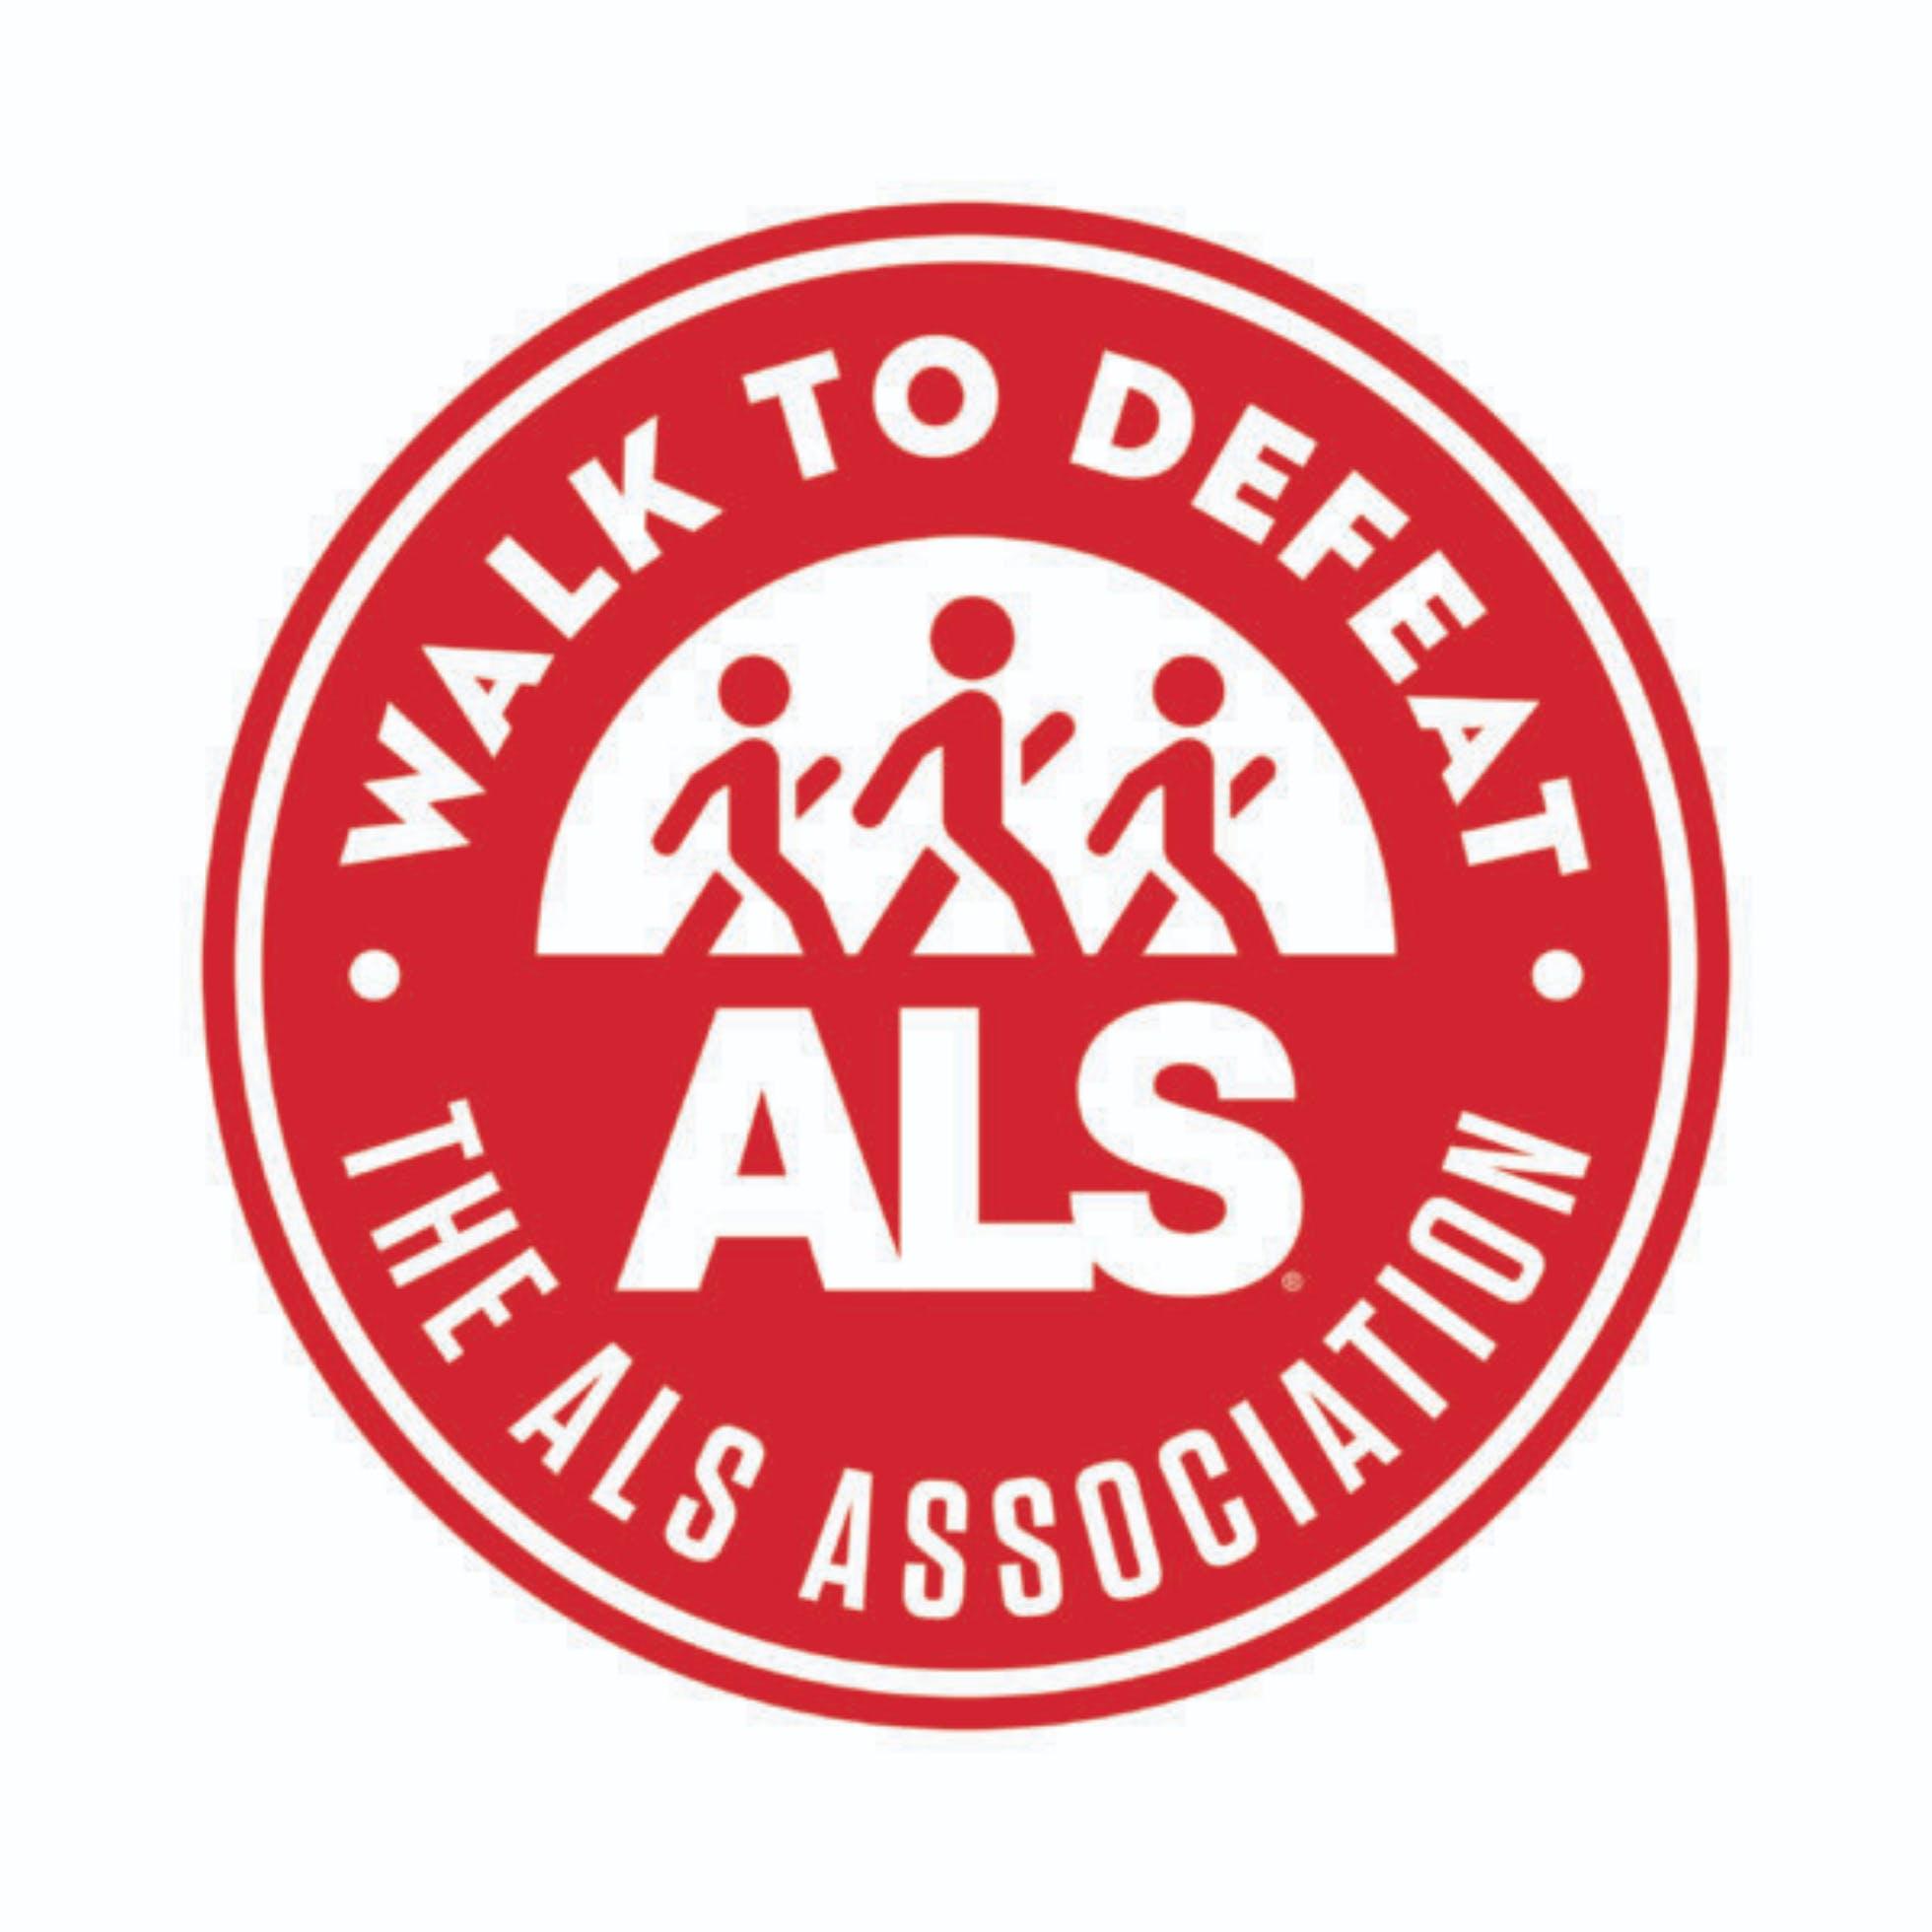 2021 Walk to Defeat ALS